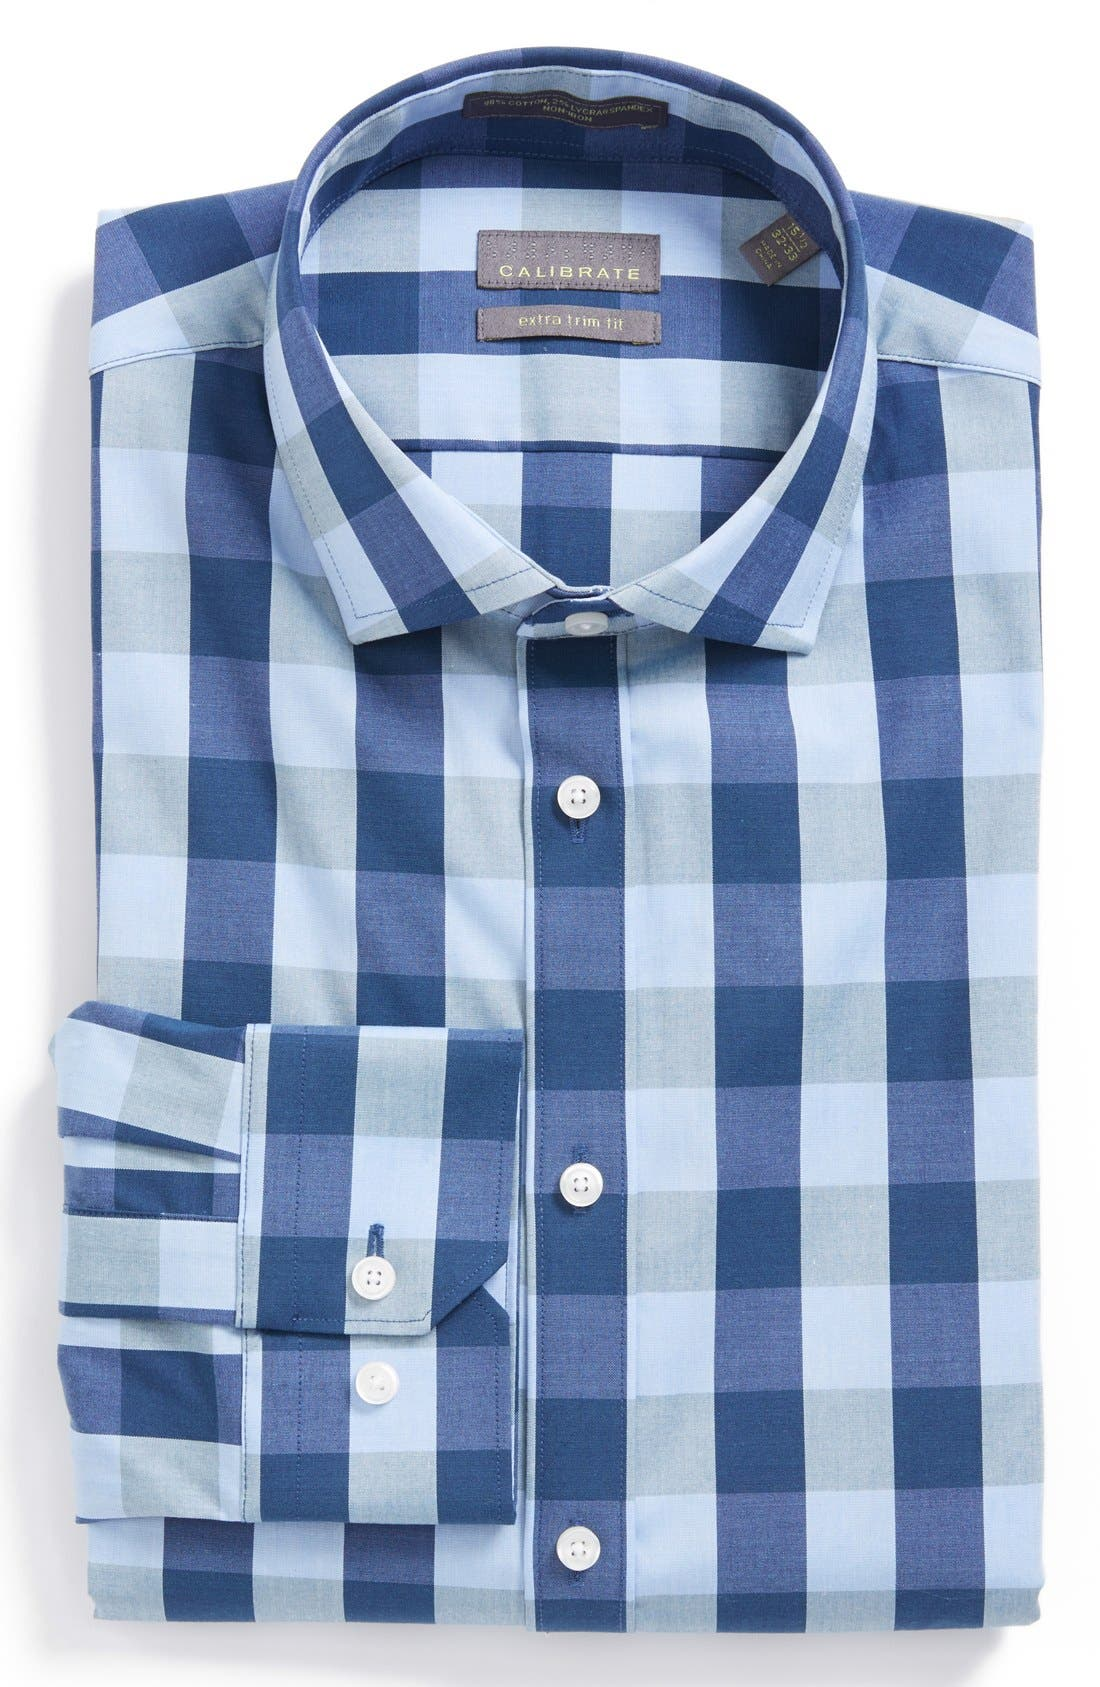 Alternate Image 1 Selected - Calibrate Extra Trim Fit Stretch Dress Shirt